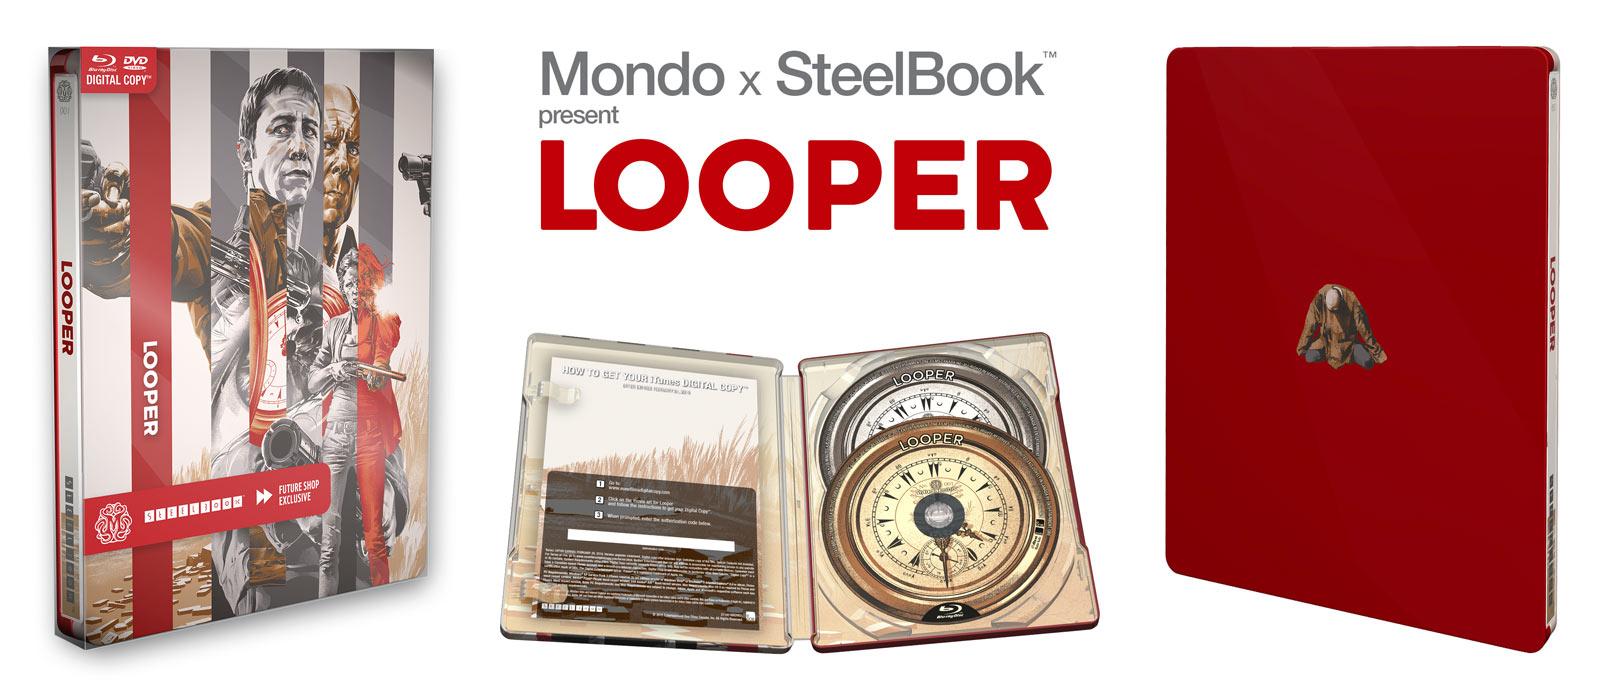 looper-mondo-x-steelbook-standard